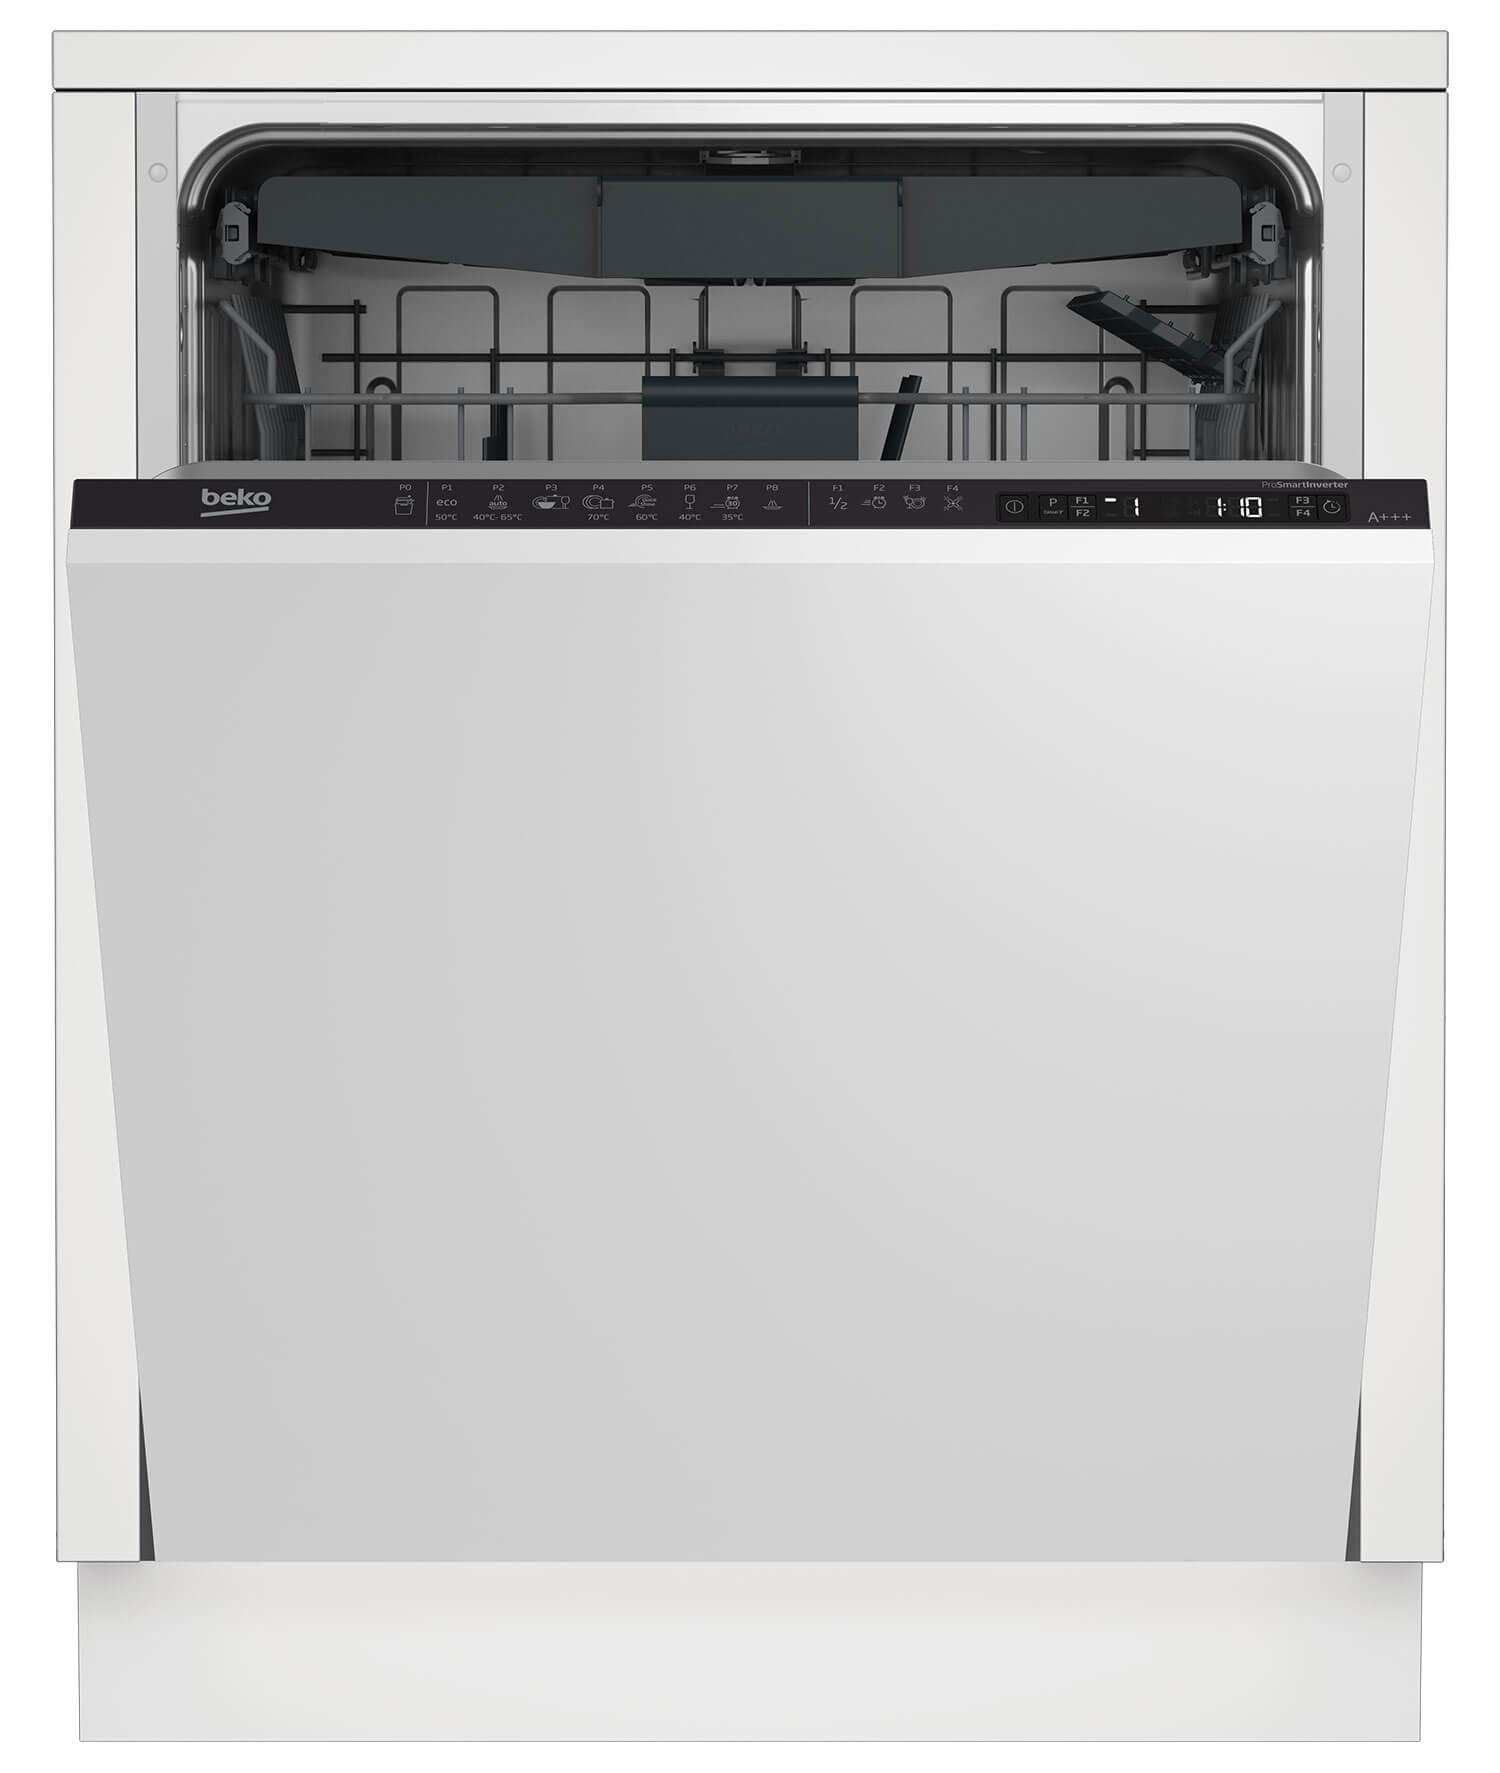 Masina de spalat vase Beko DIN28430